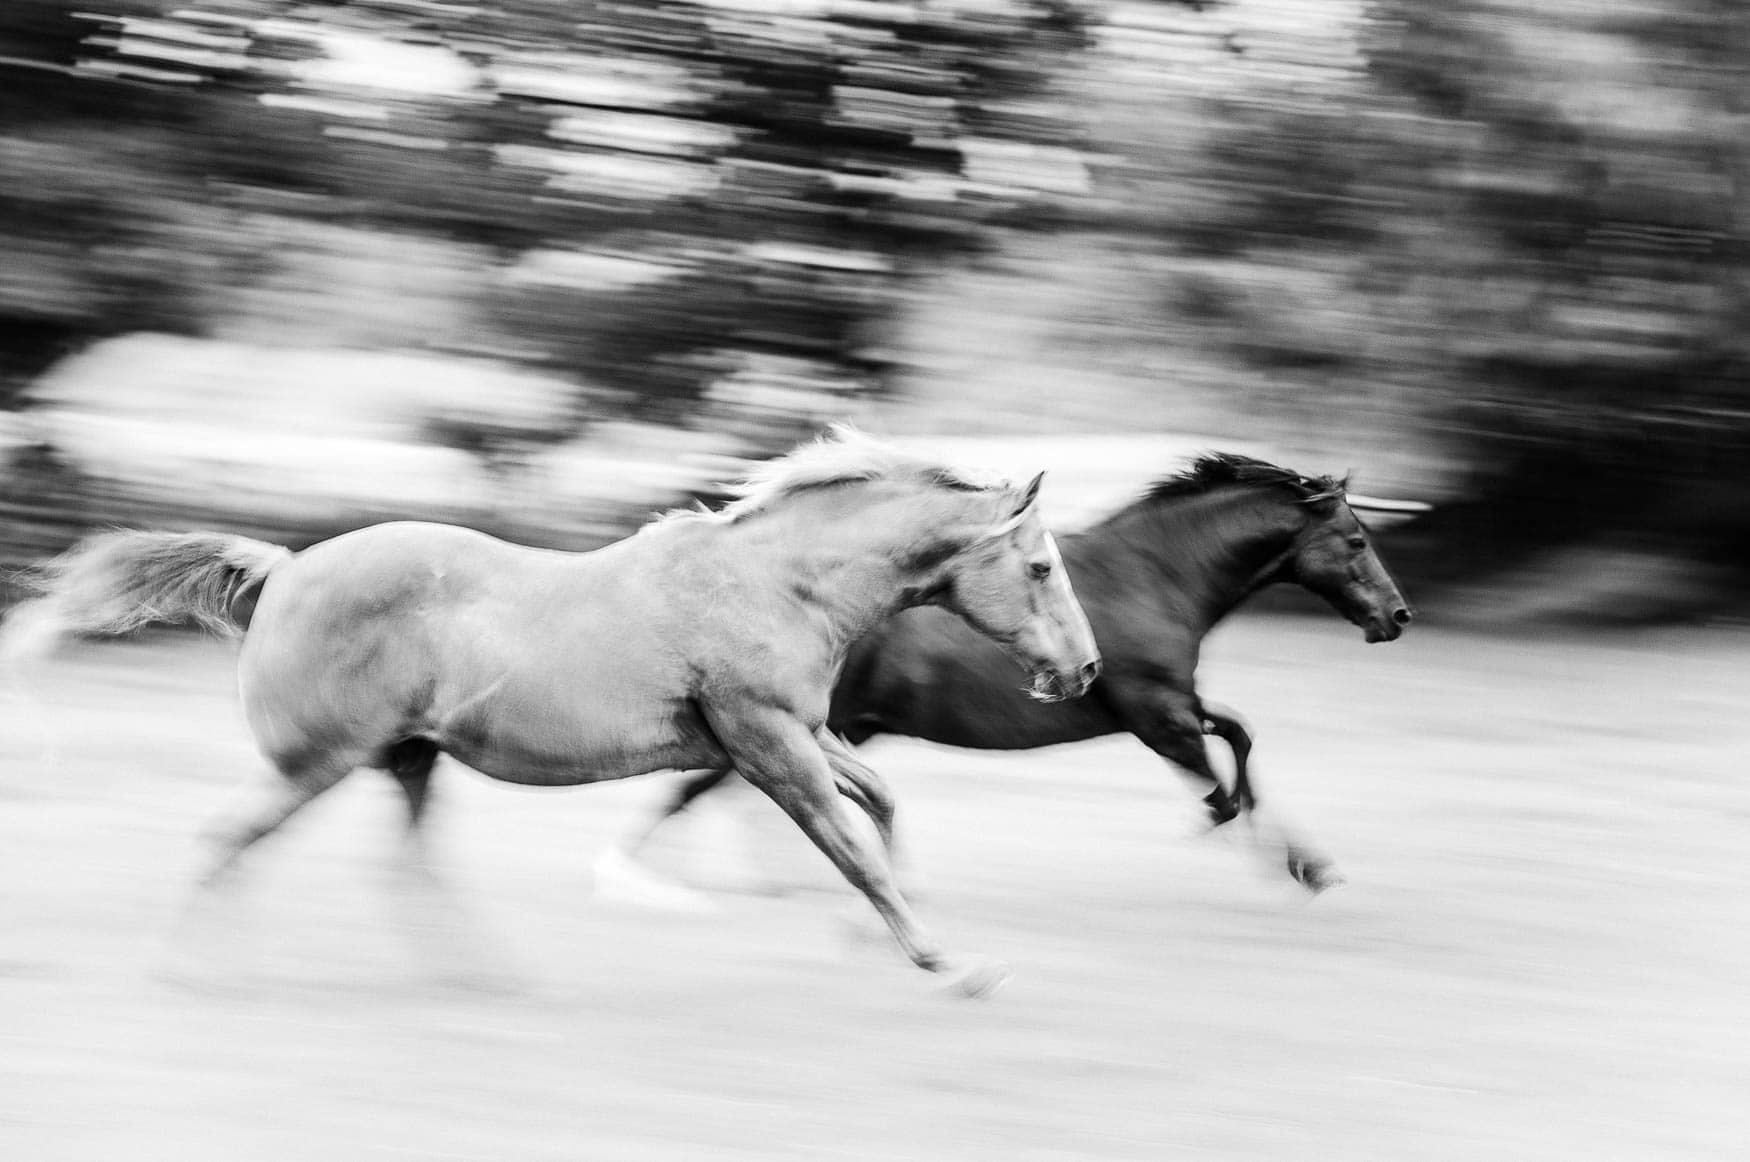 At liberty horse photography